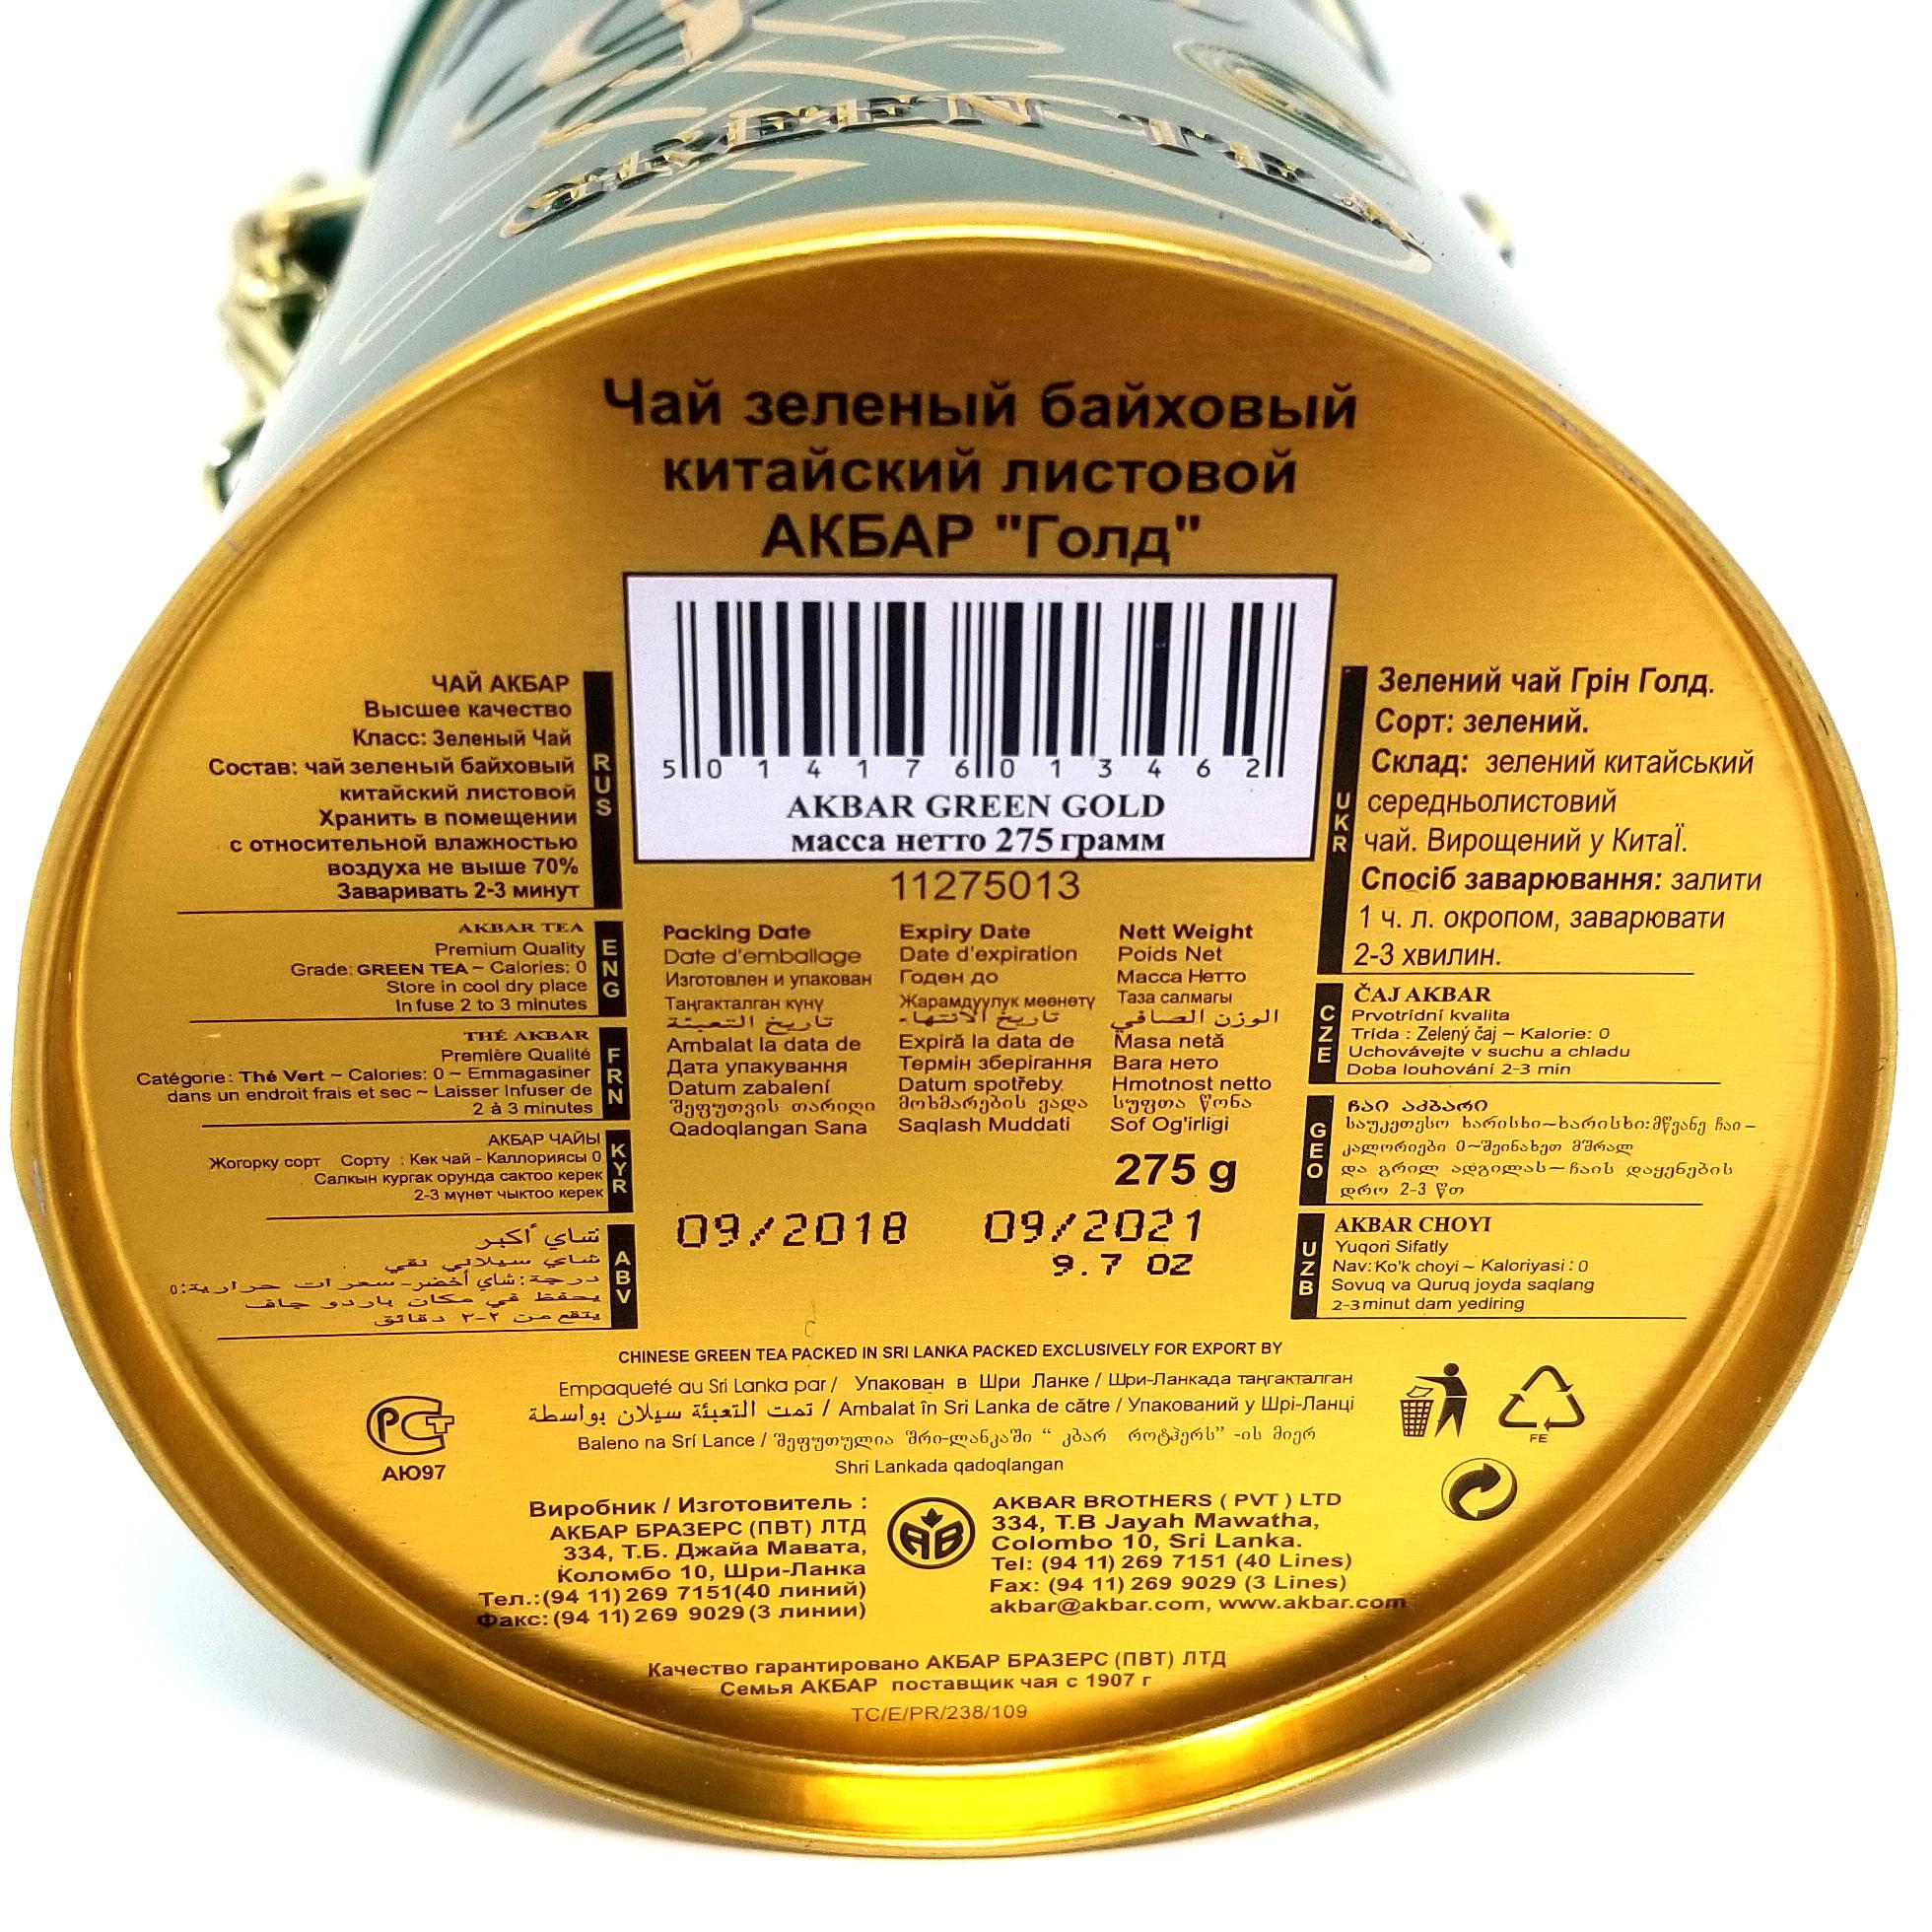 SALE! Akbar Premium Quality Gold Collection Green Tea, 9.6 oz / 275 g